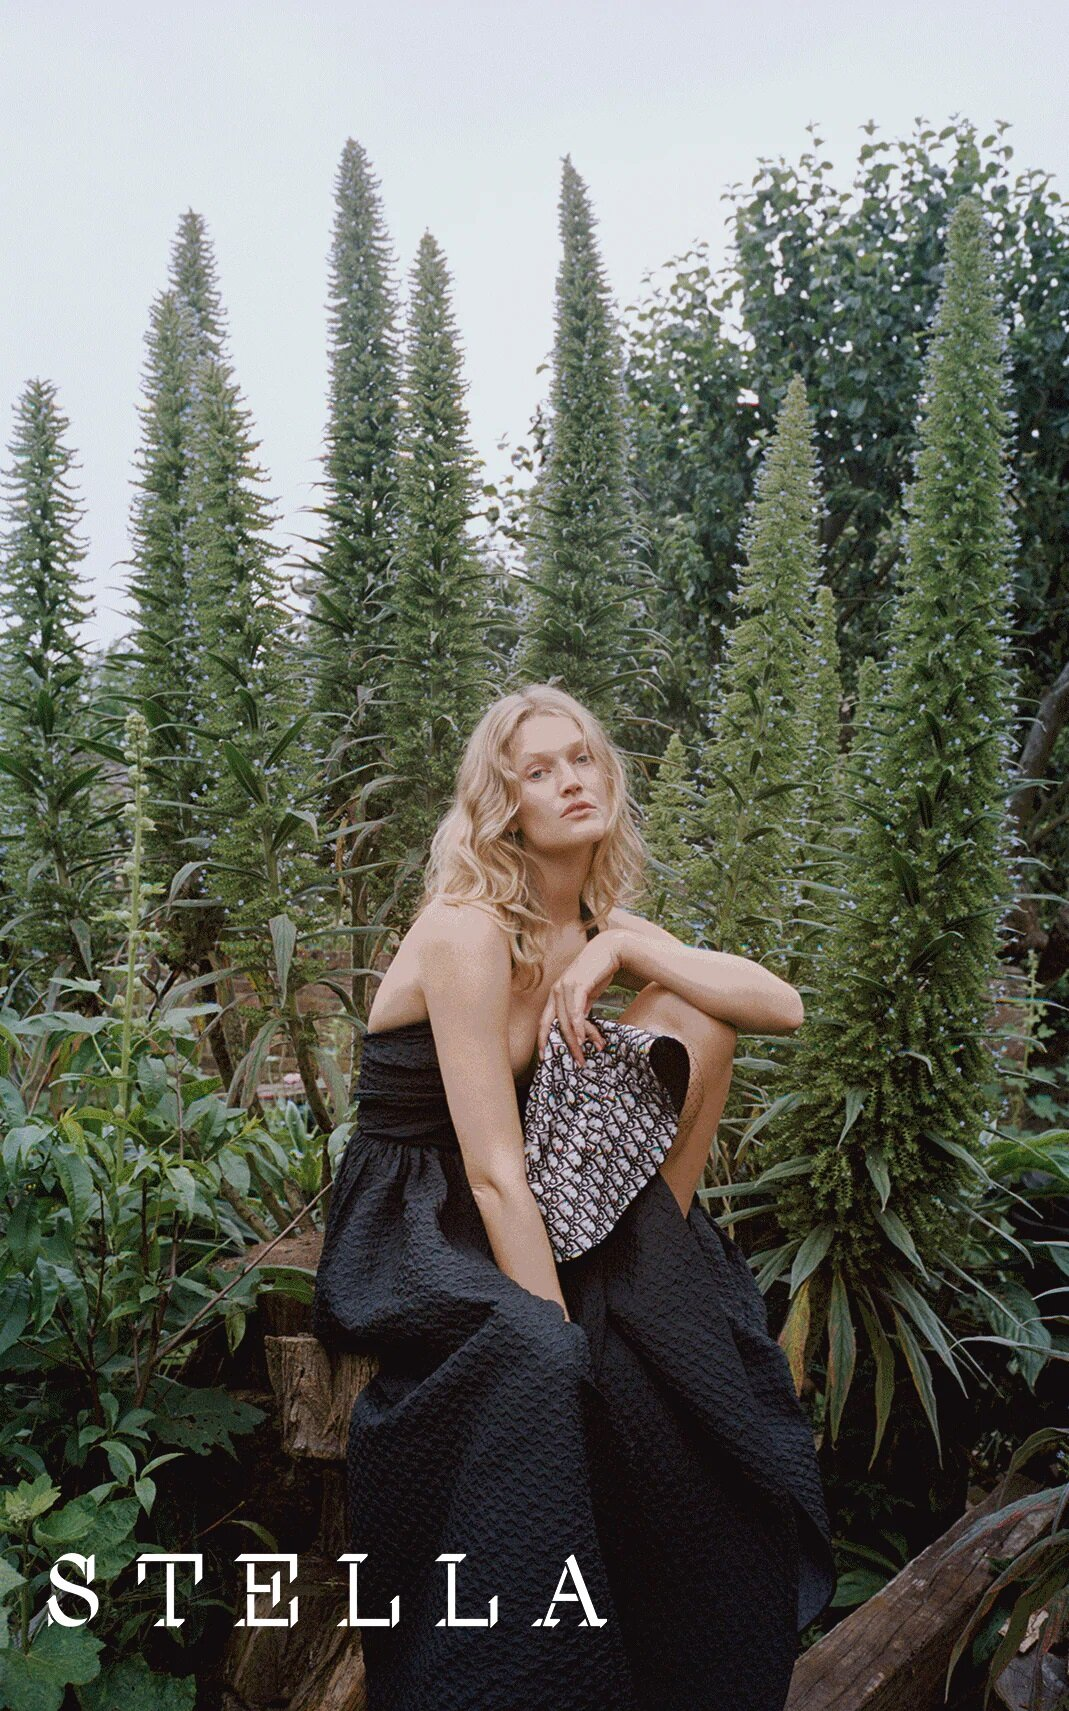 Olivia-Frolich-Stella-Magazine-Toni-Garrn-10.jpg